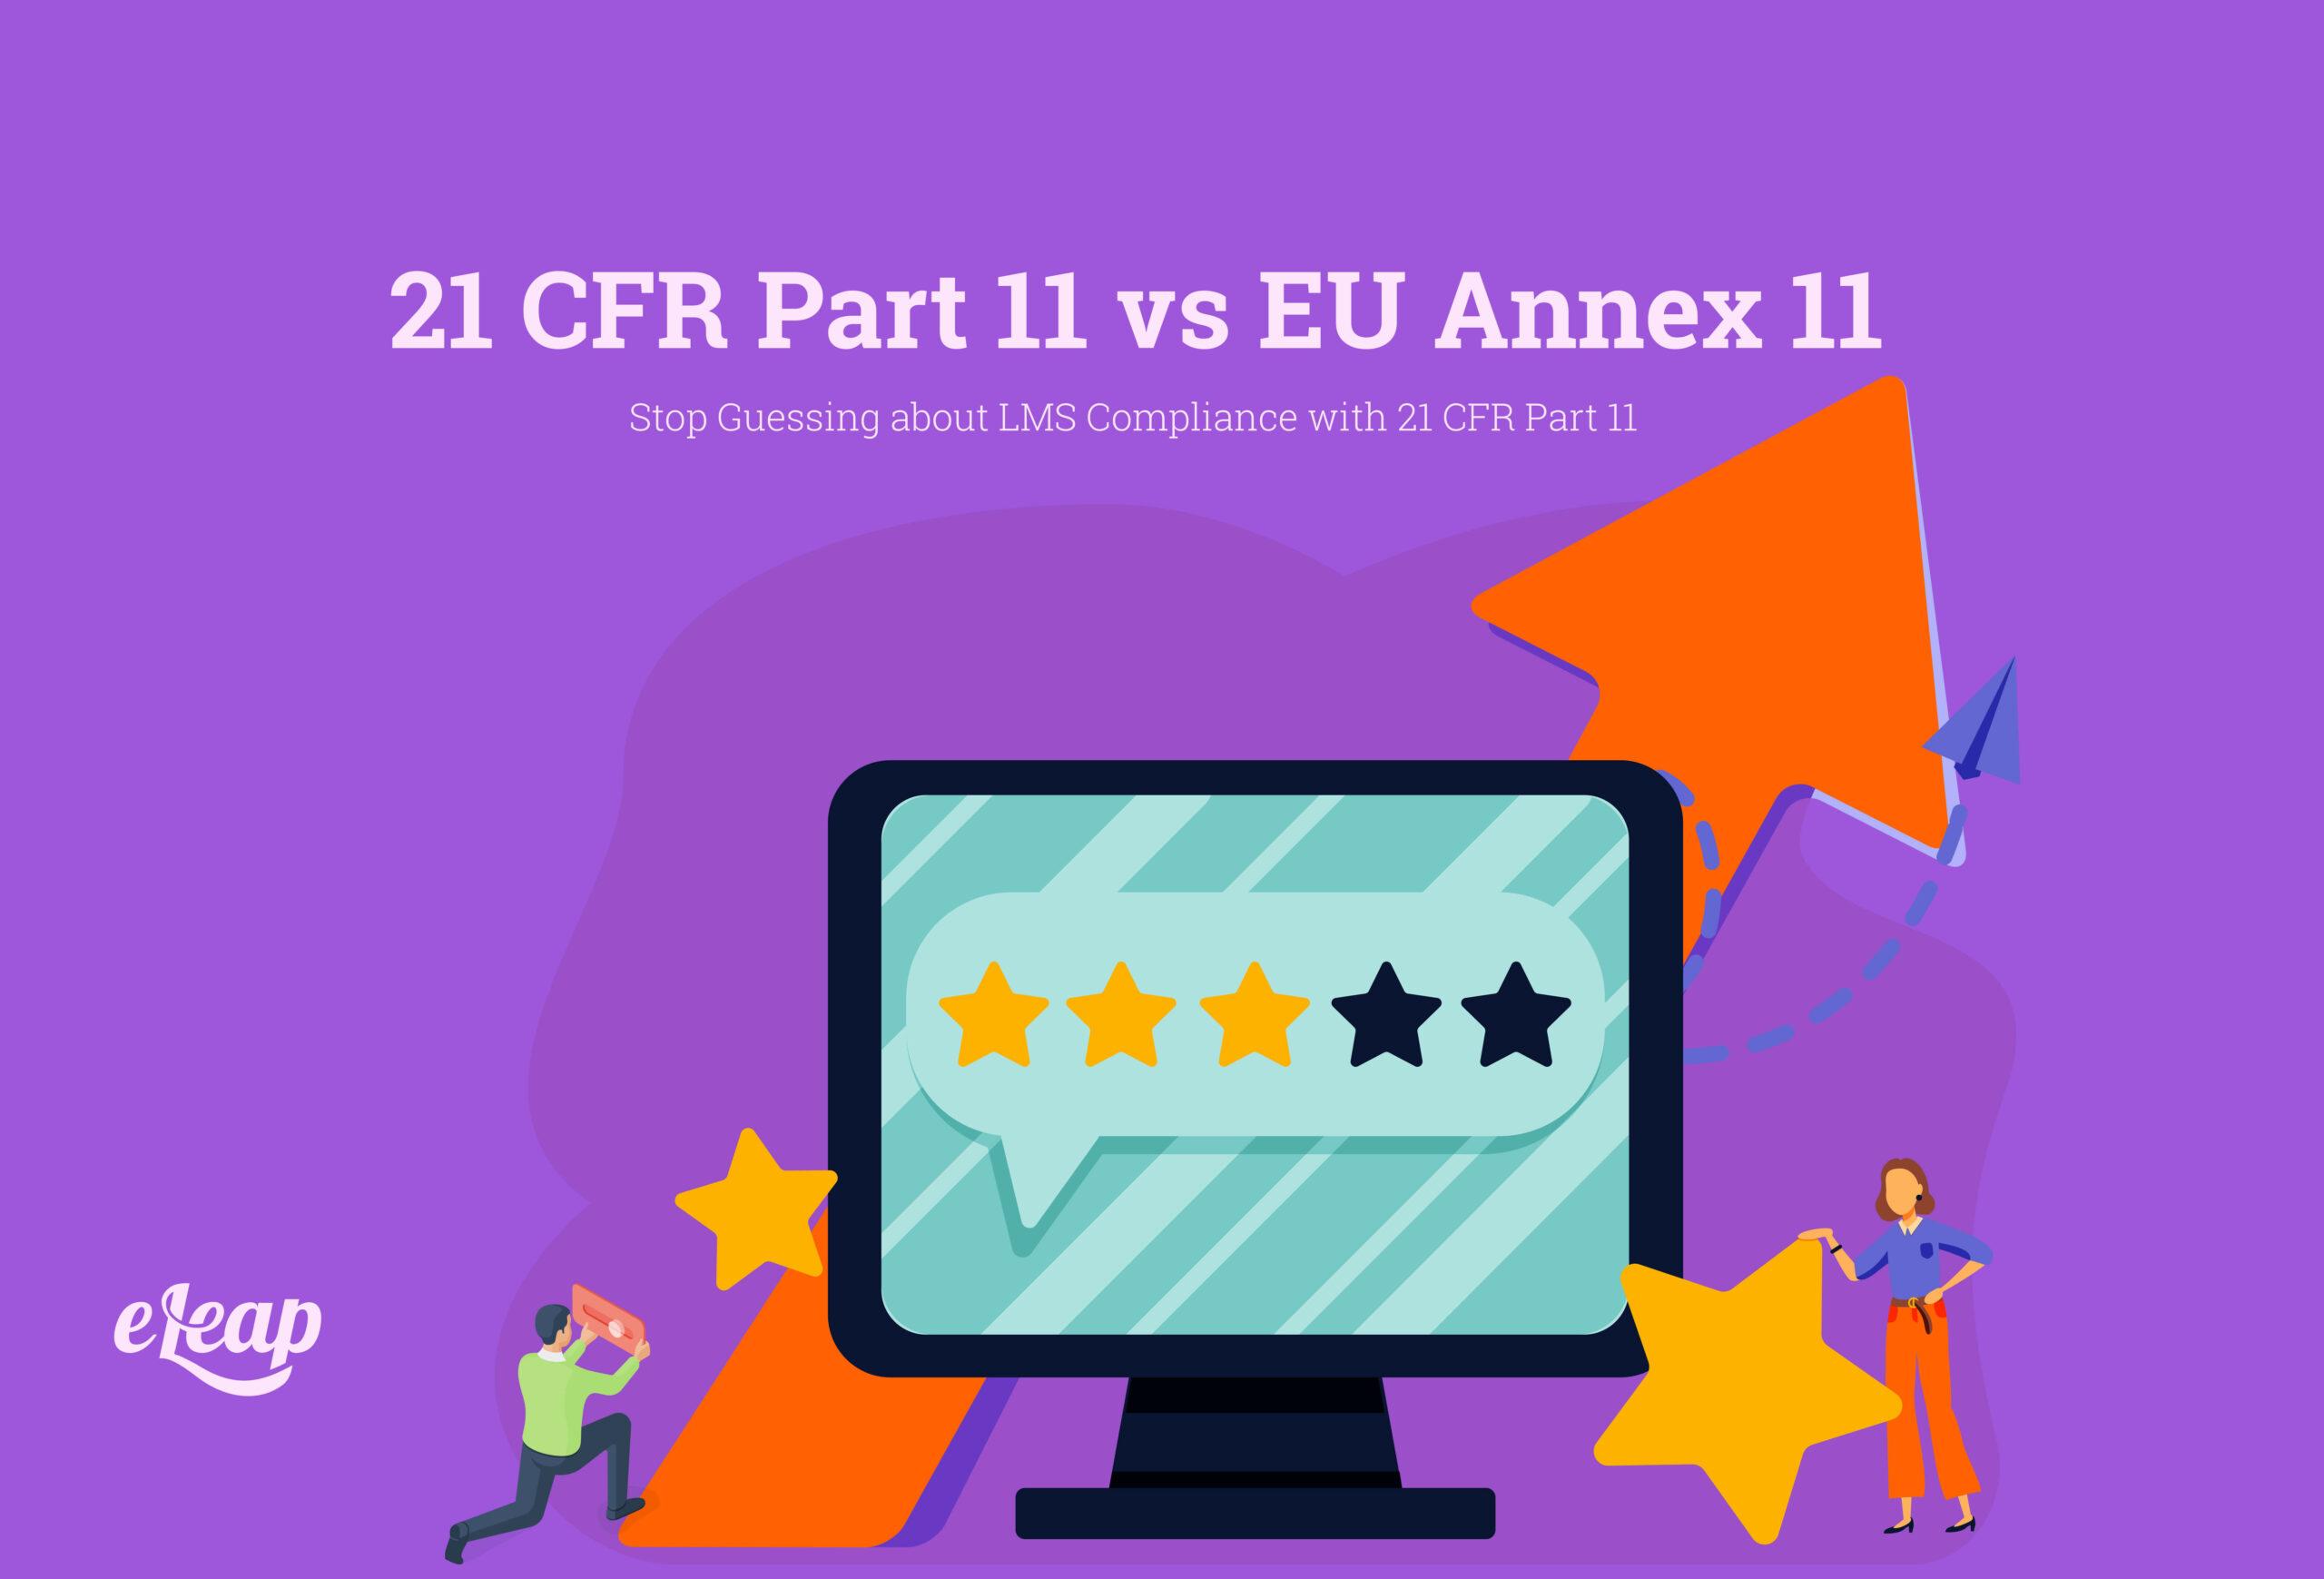 21 CFR Part 11 vs EU Annex 11